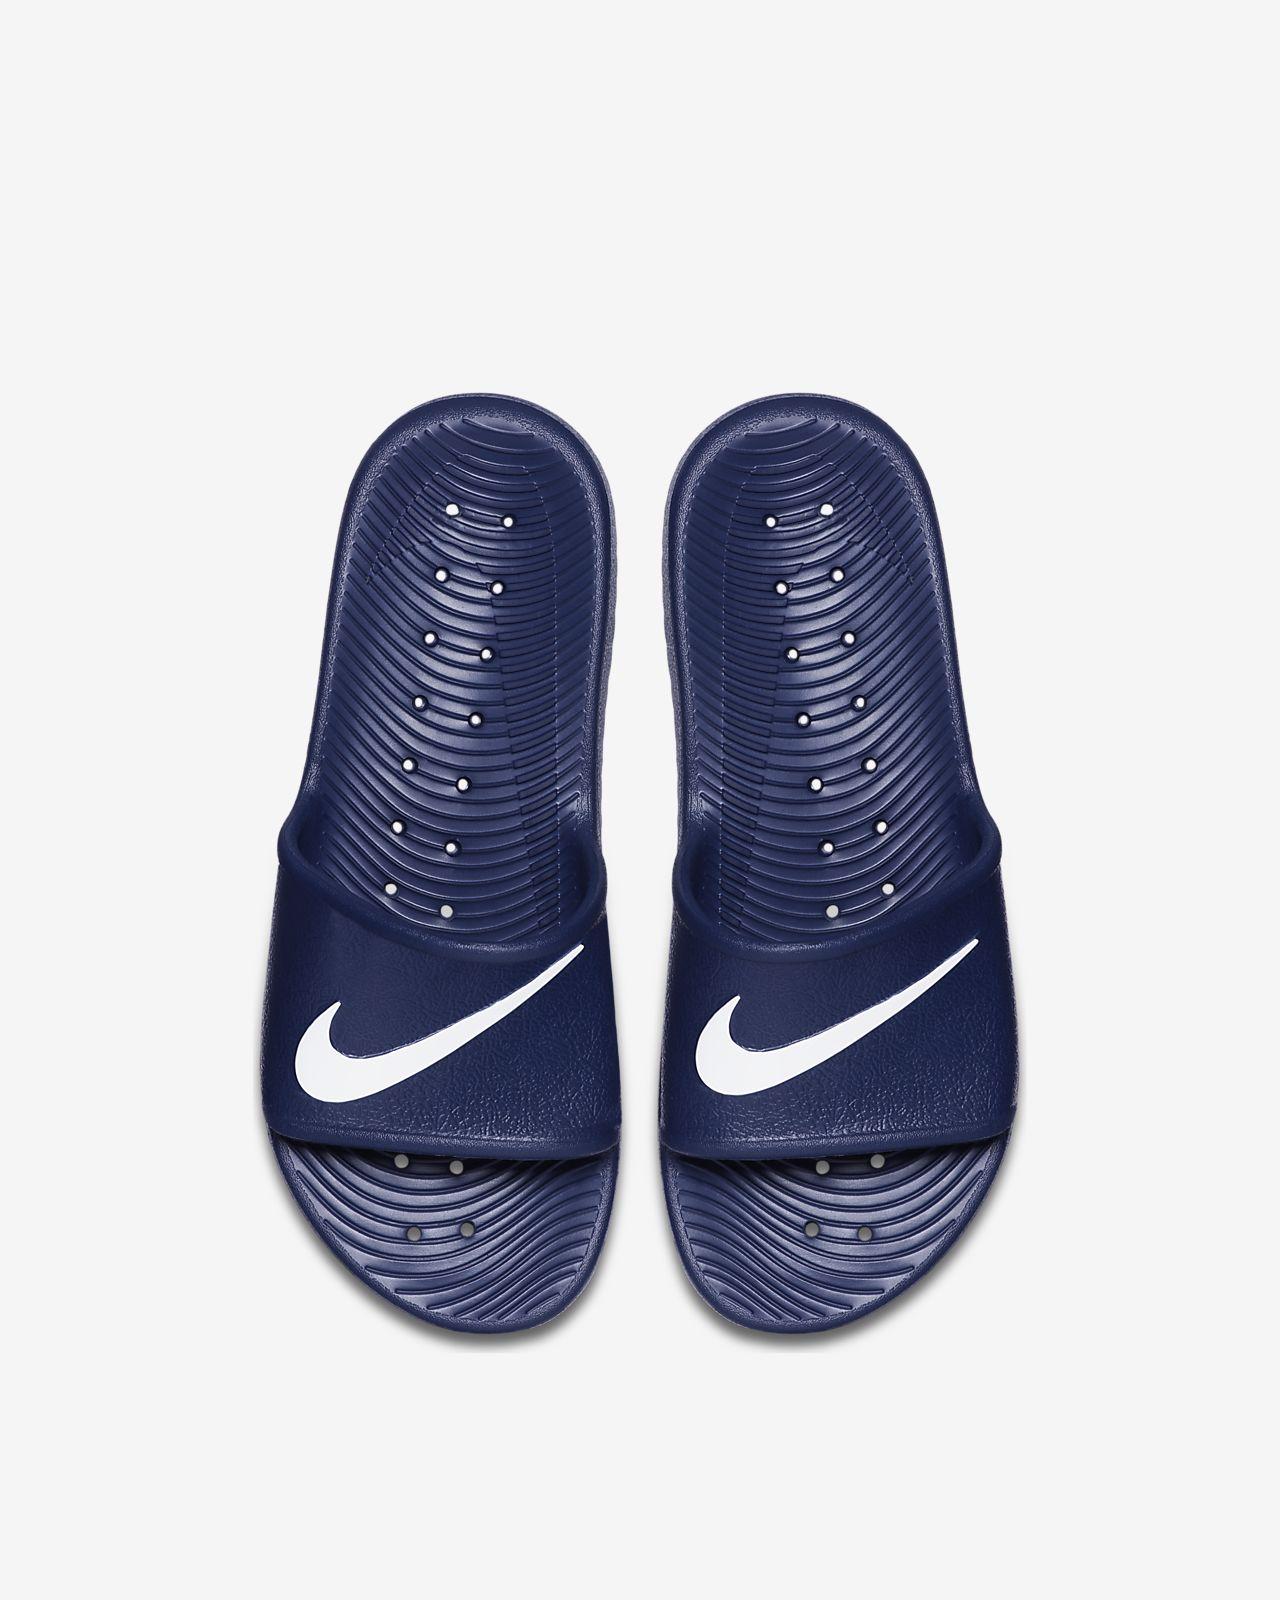 Nike Kawa Shower Chanclas - Hombre. Nike.com ES 6283e024bfdaa